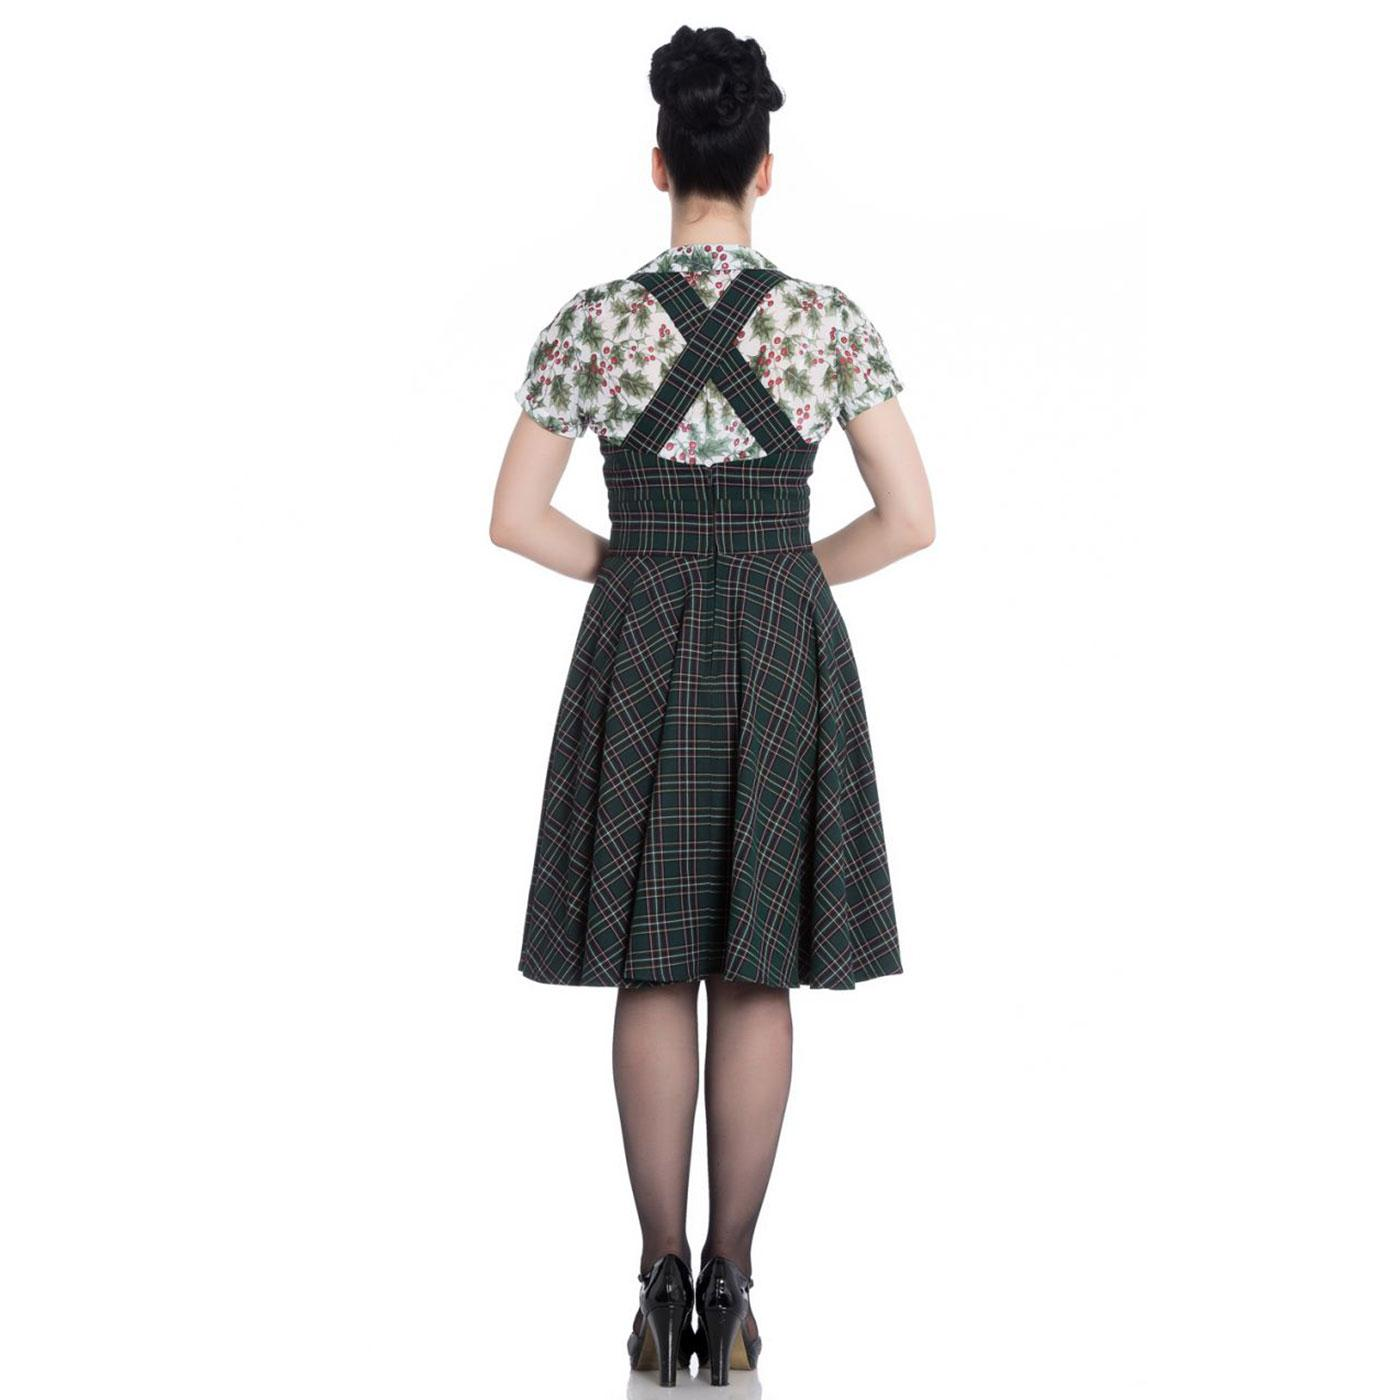 HELL BUNNY Peebles 50s Vintage Tartan Pinafore Dress GR